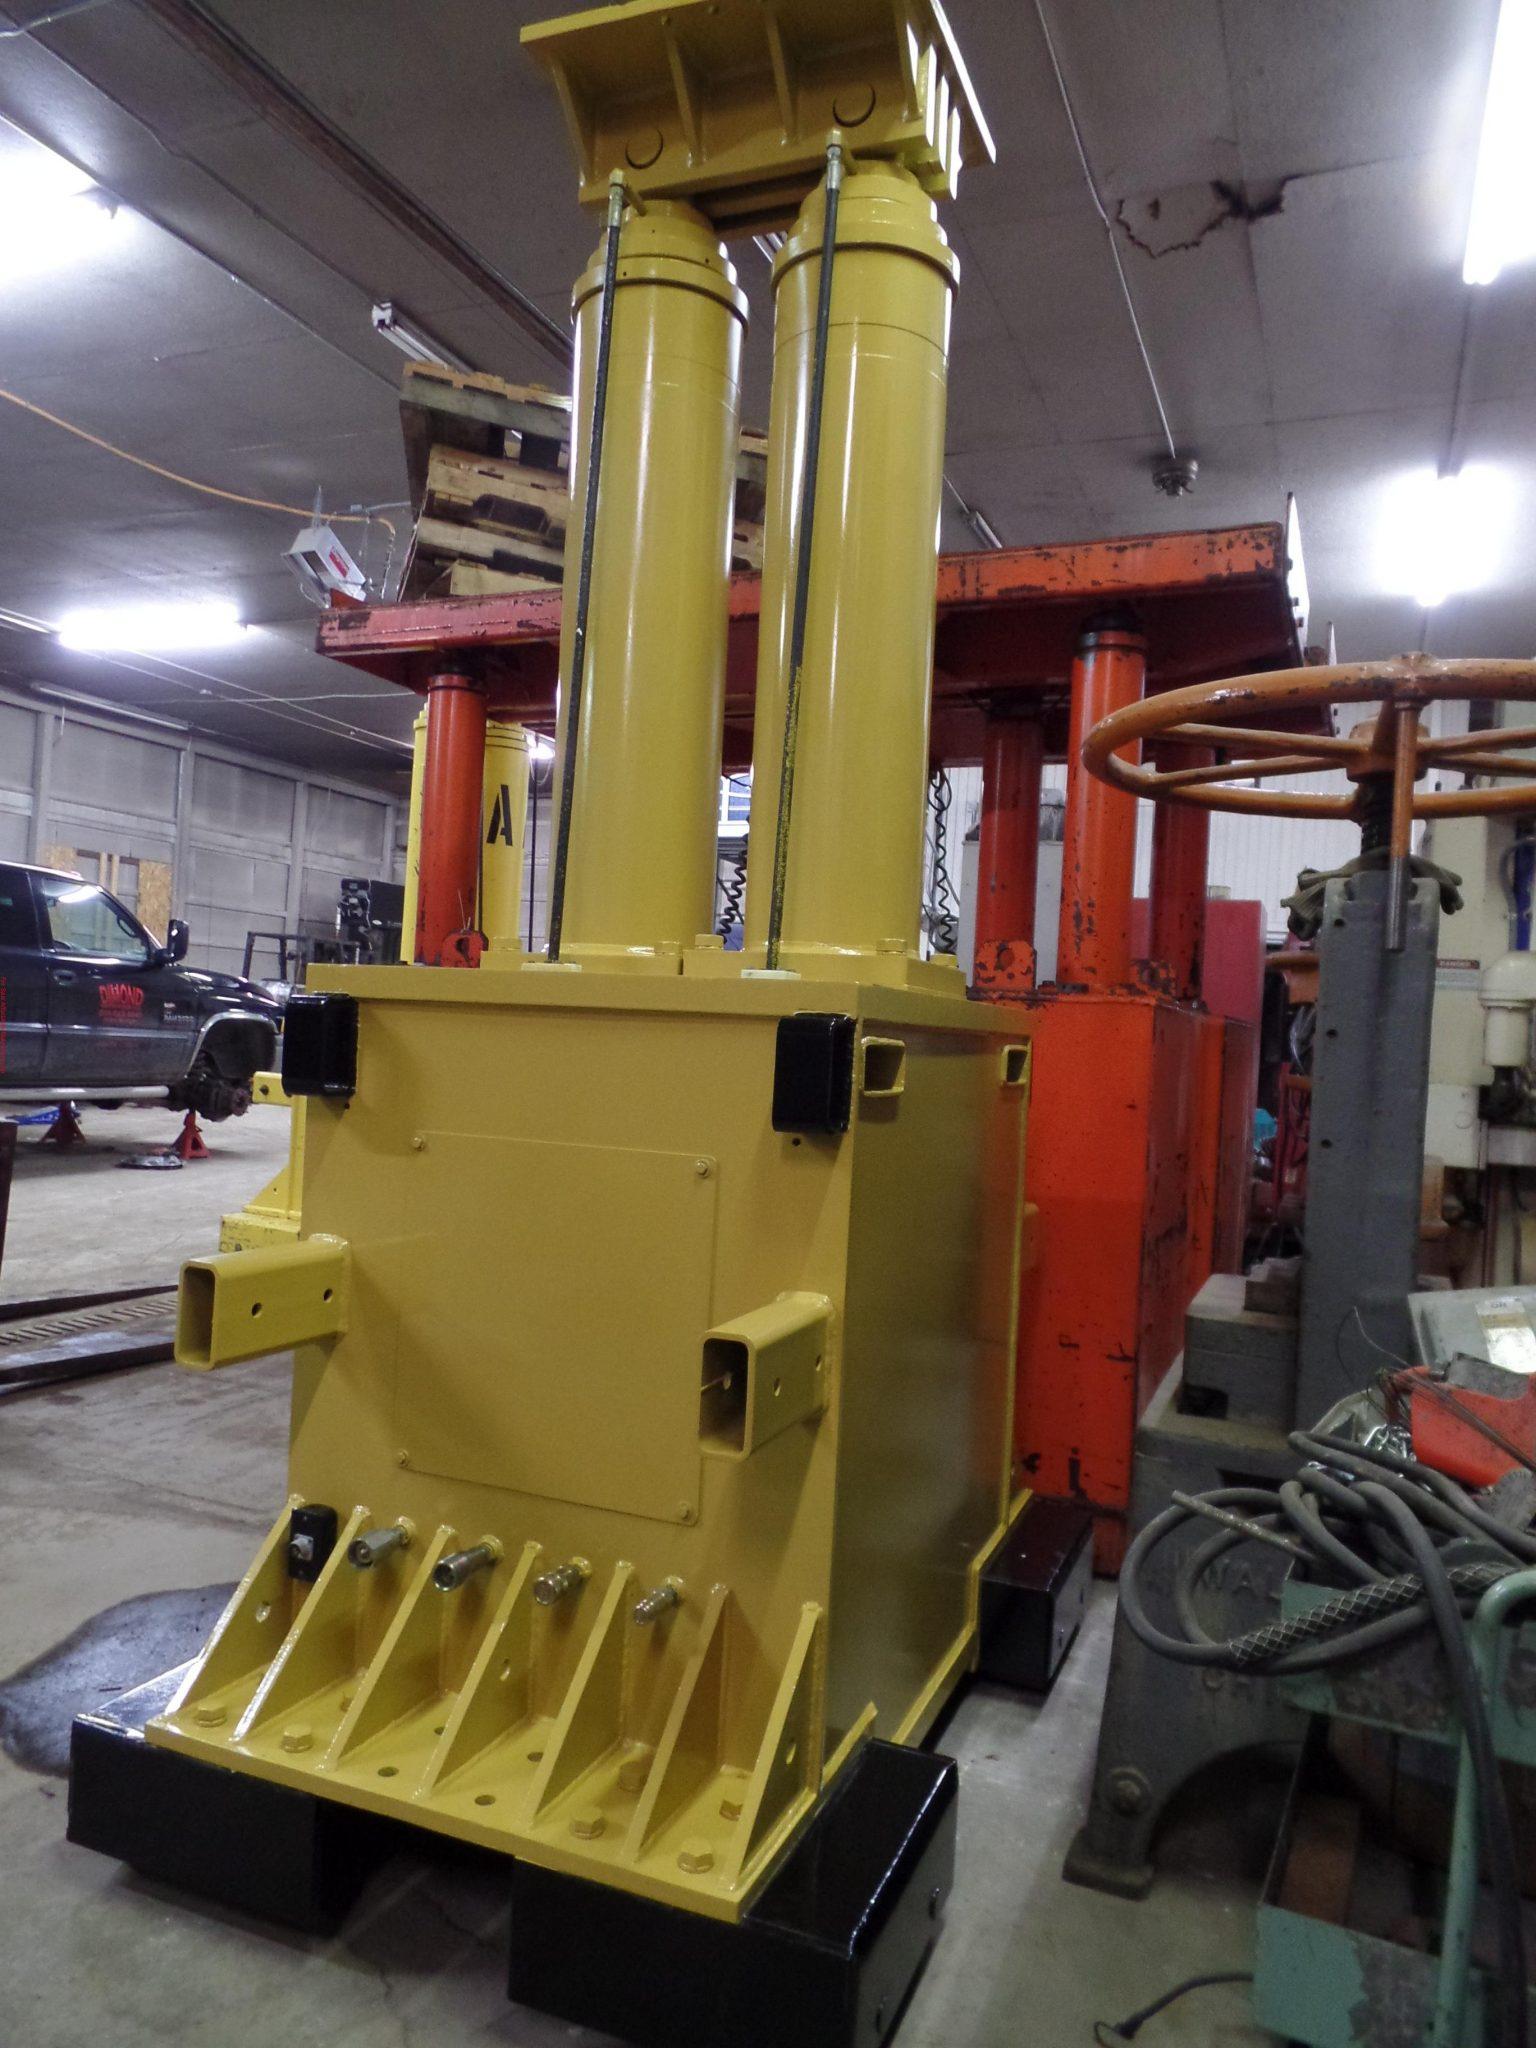 1,000 Ton Lift Systems Hydraulic Gantry Crane System For Sale